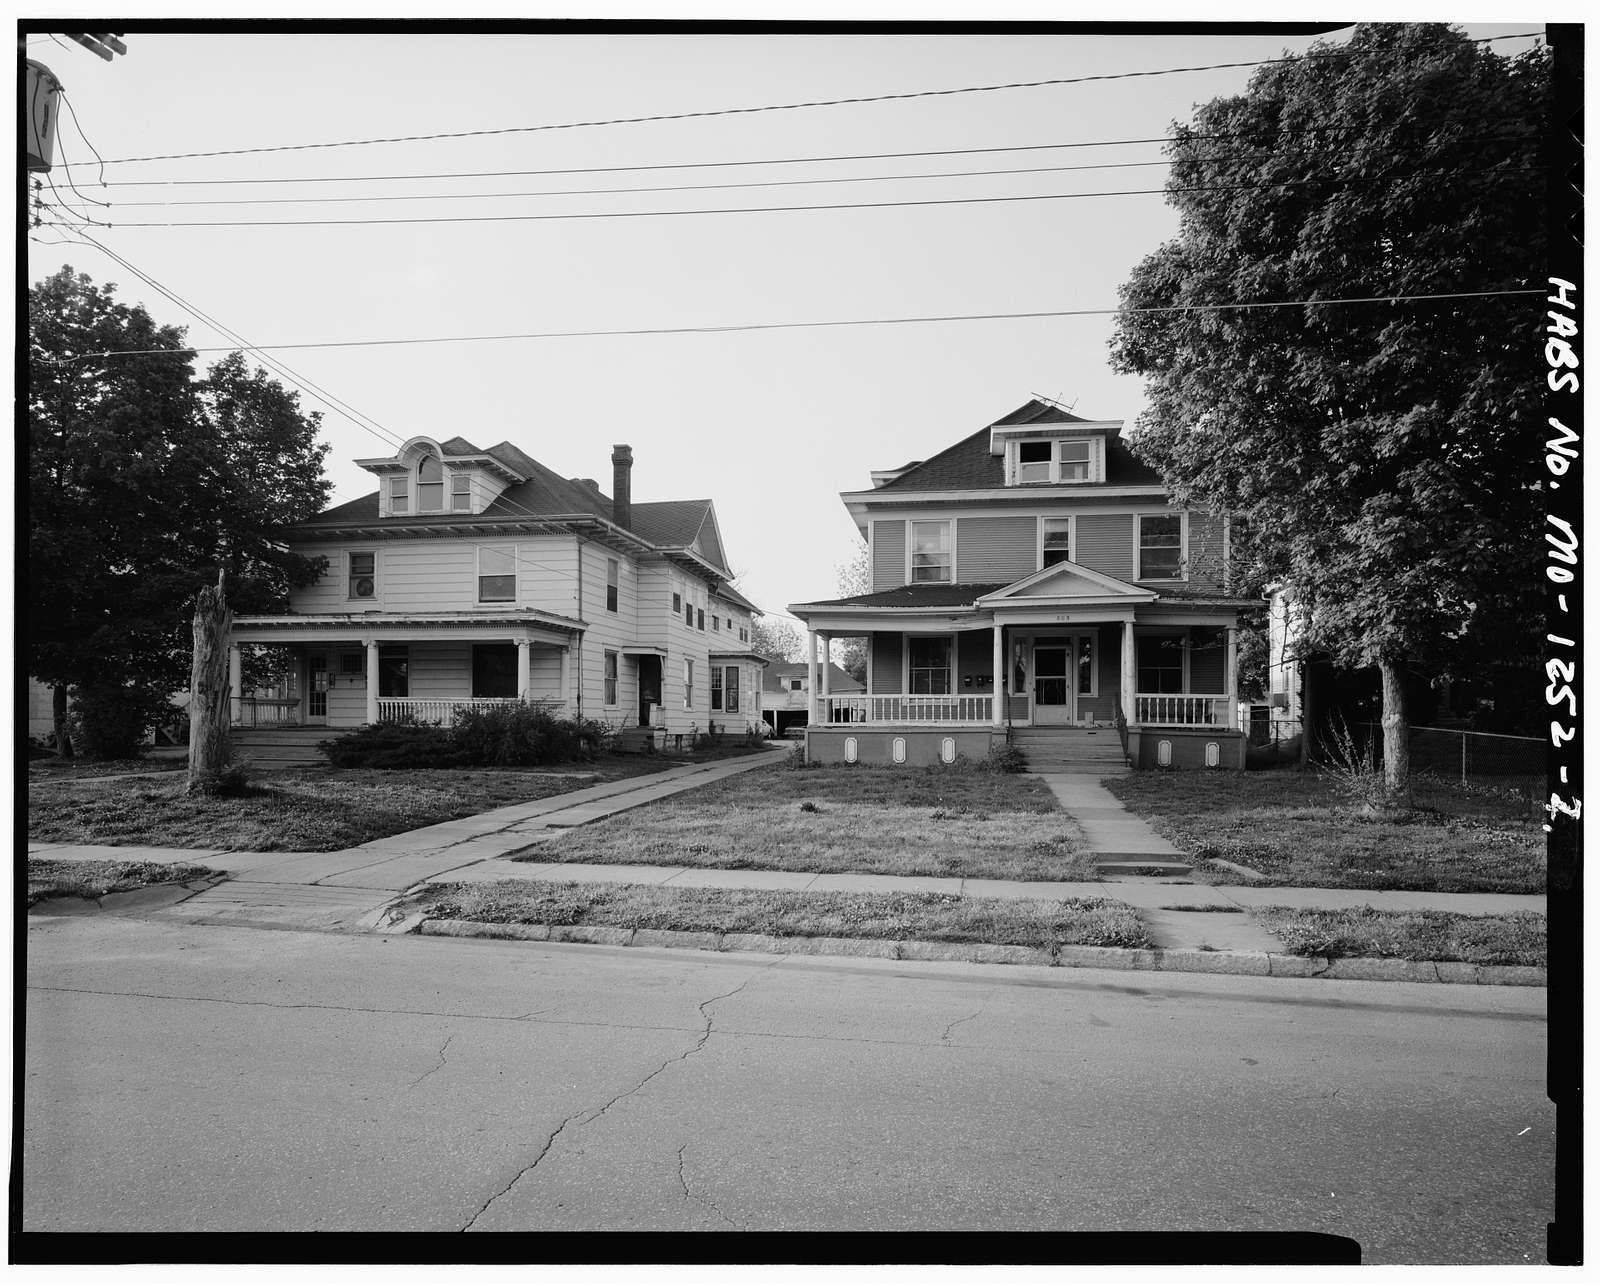 Walnut-Dollison Historic District, South Dollison, East Elm, East Cherry & East Walnut Streets, Springfield, Greene County, MO